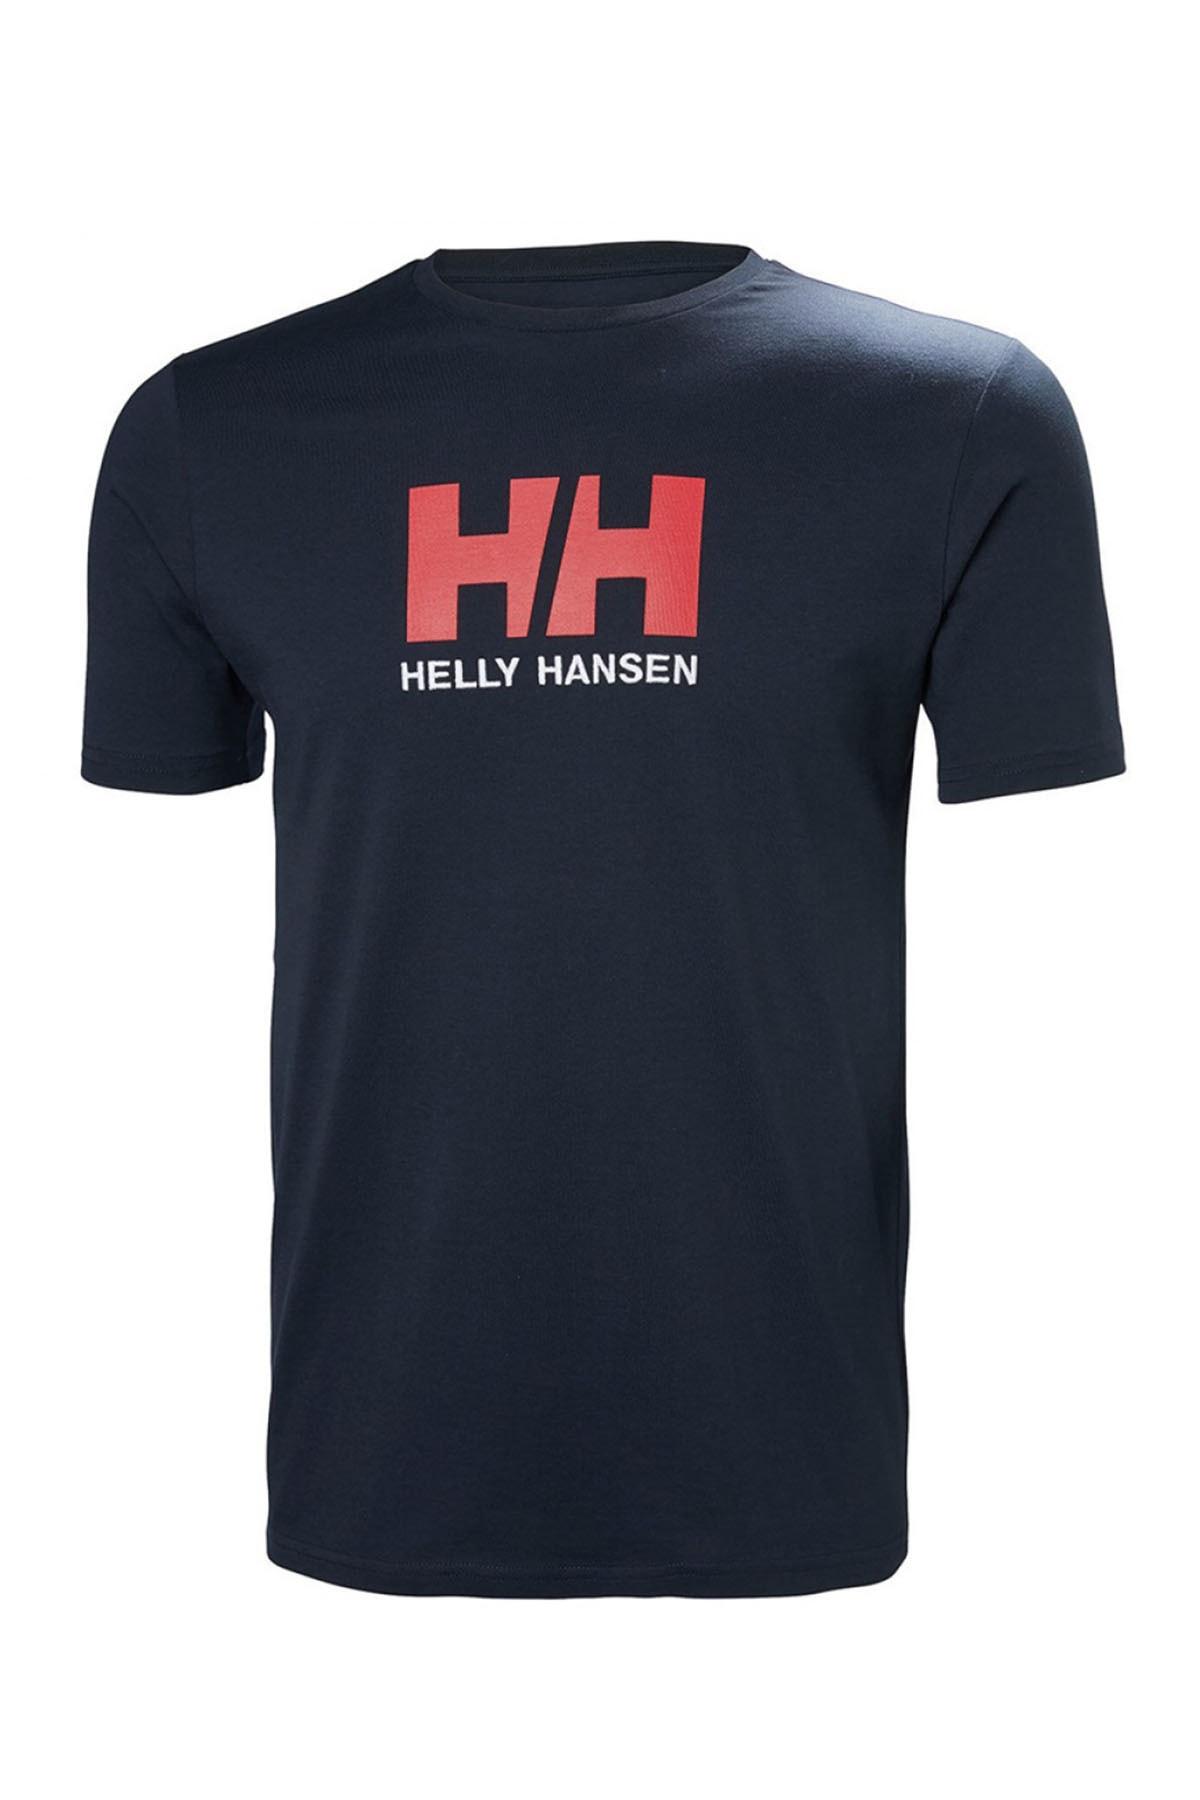 Helly Hansen Erkek Spor T-Shirt - 33979-597 1